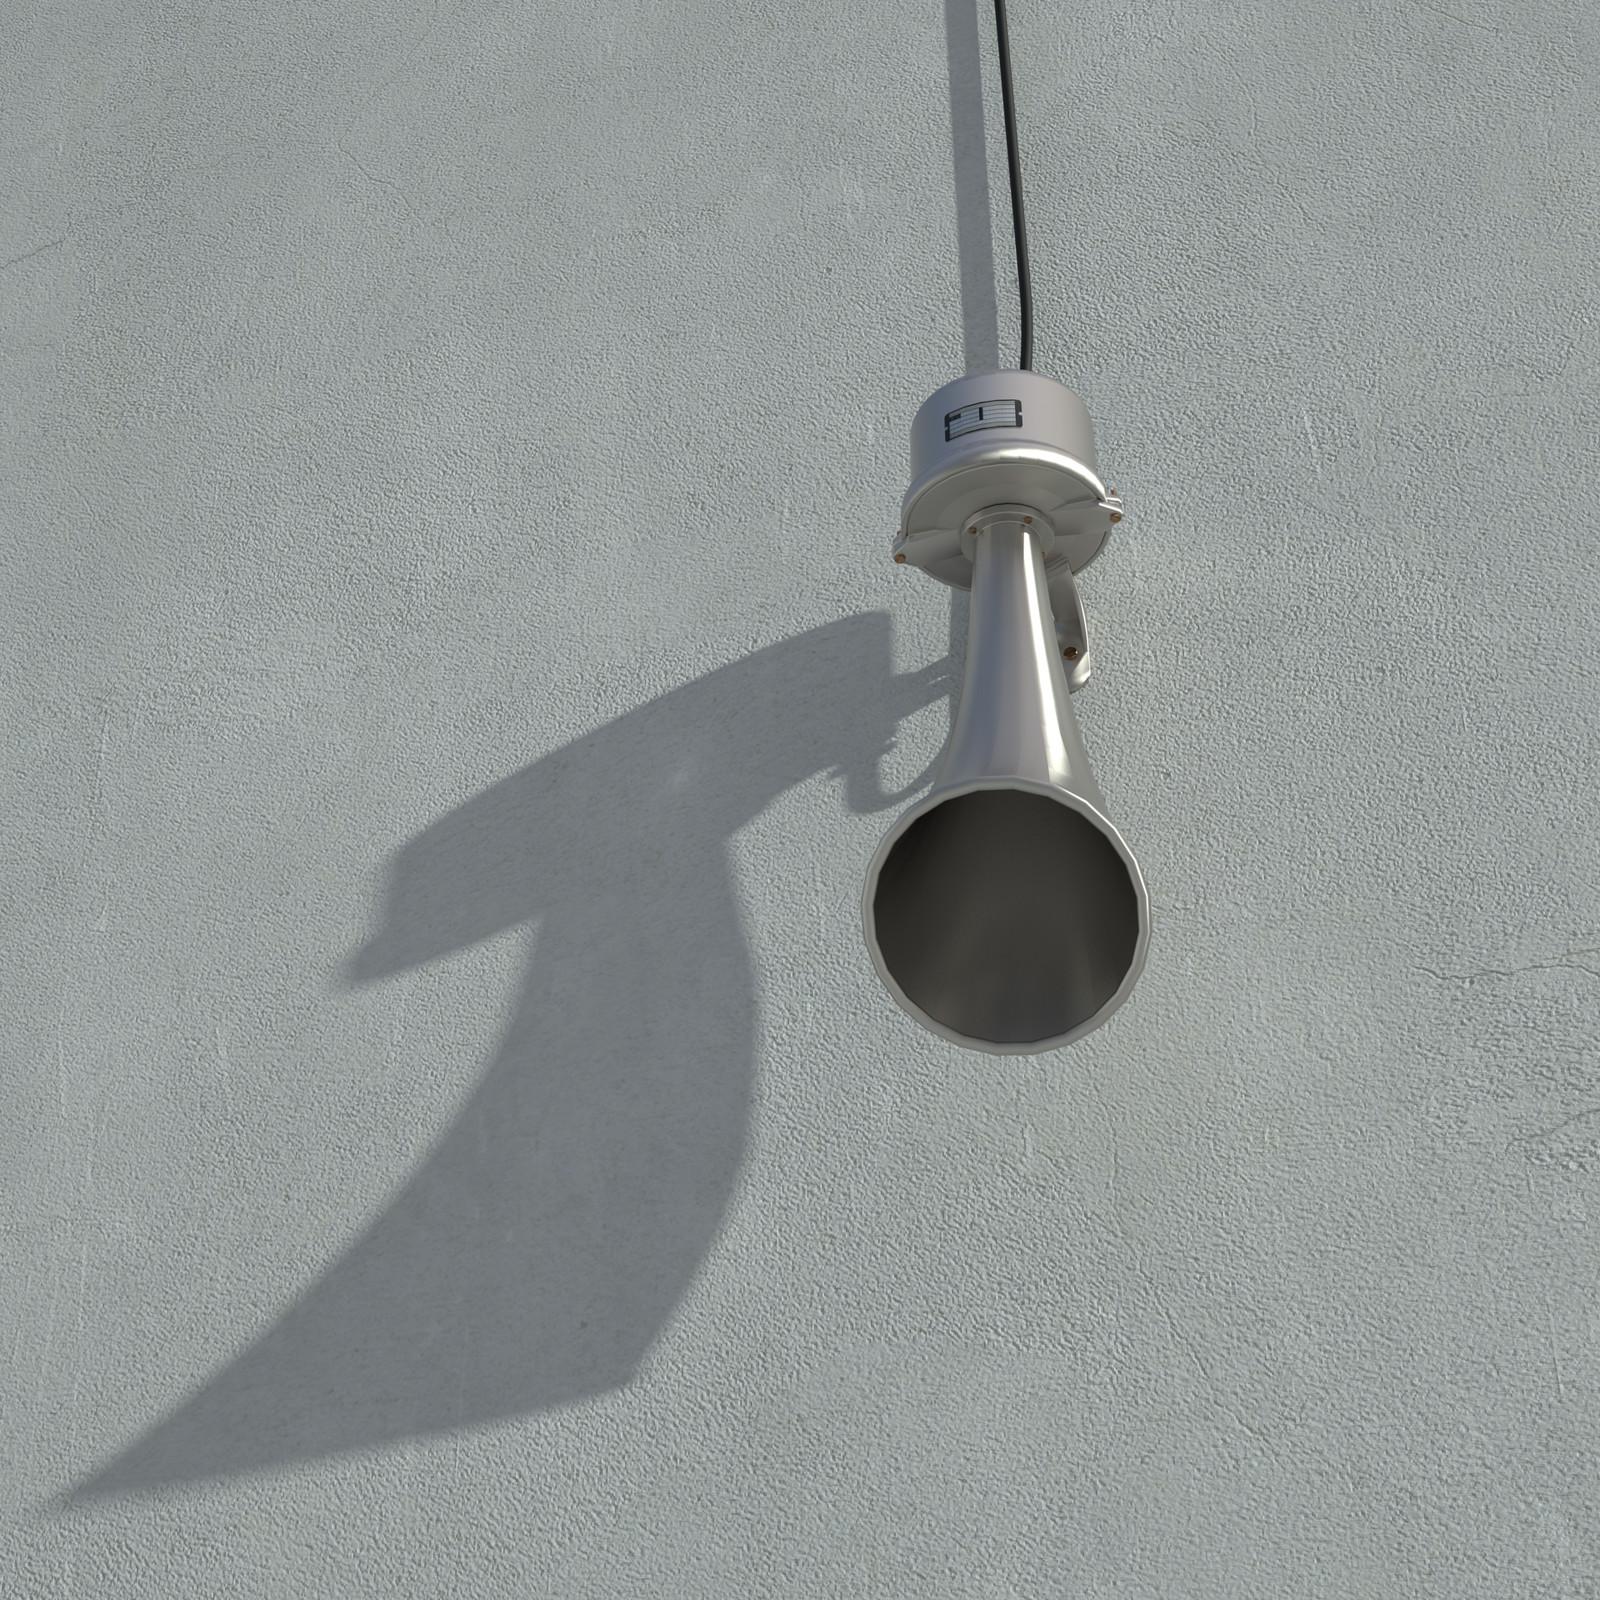 SketchUp + Thea Render  Rivendell Mill's Industrial Signal Warehouse Horns Rivendell Horns 01 Final Scene 06